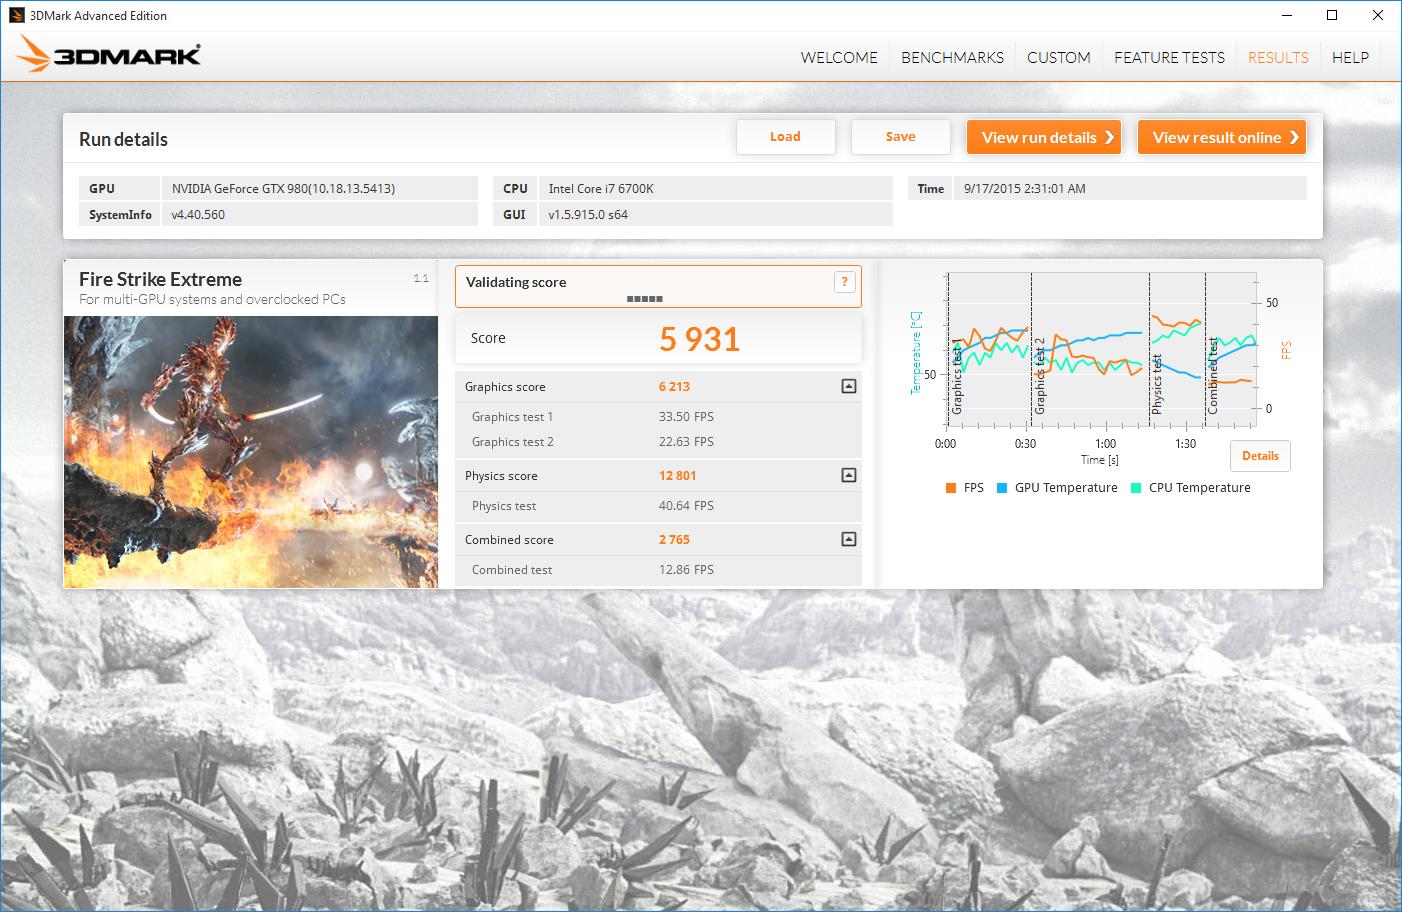 geforce-gtx-980-laptop_3dmark-firestrike